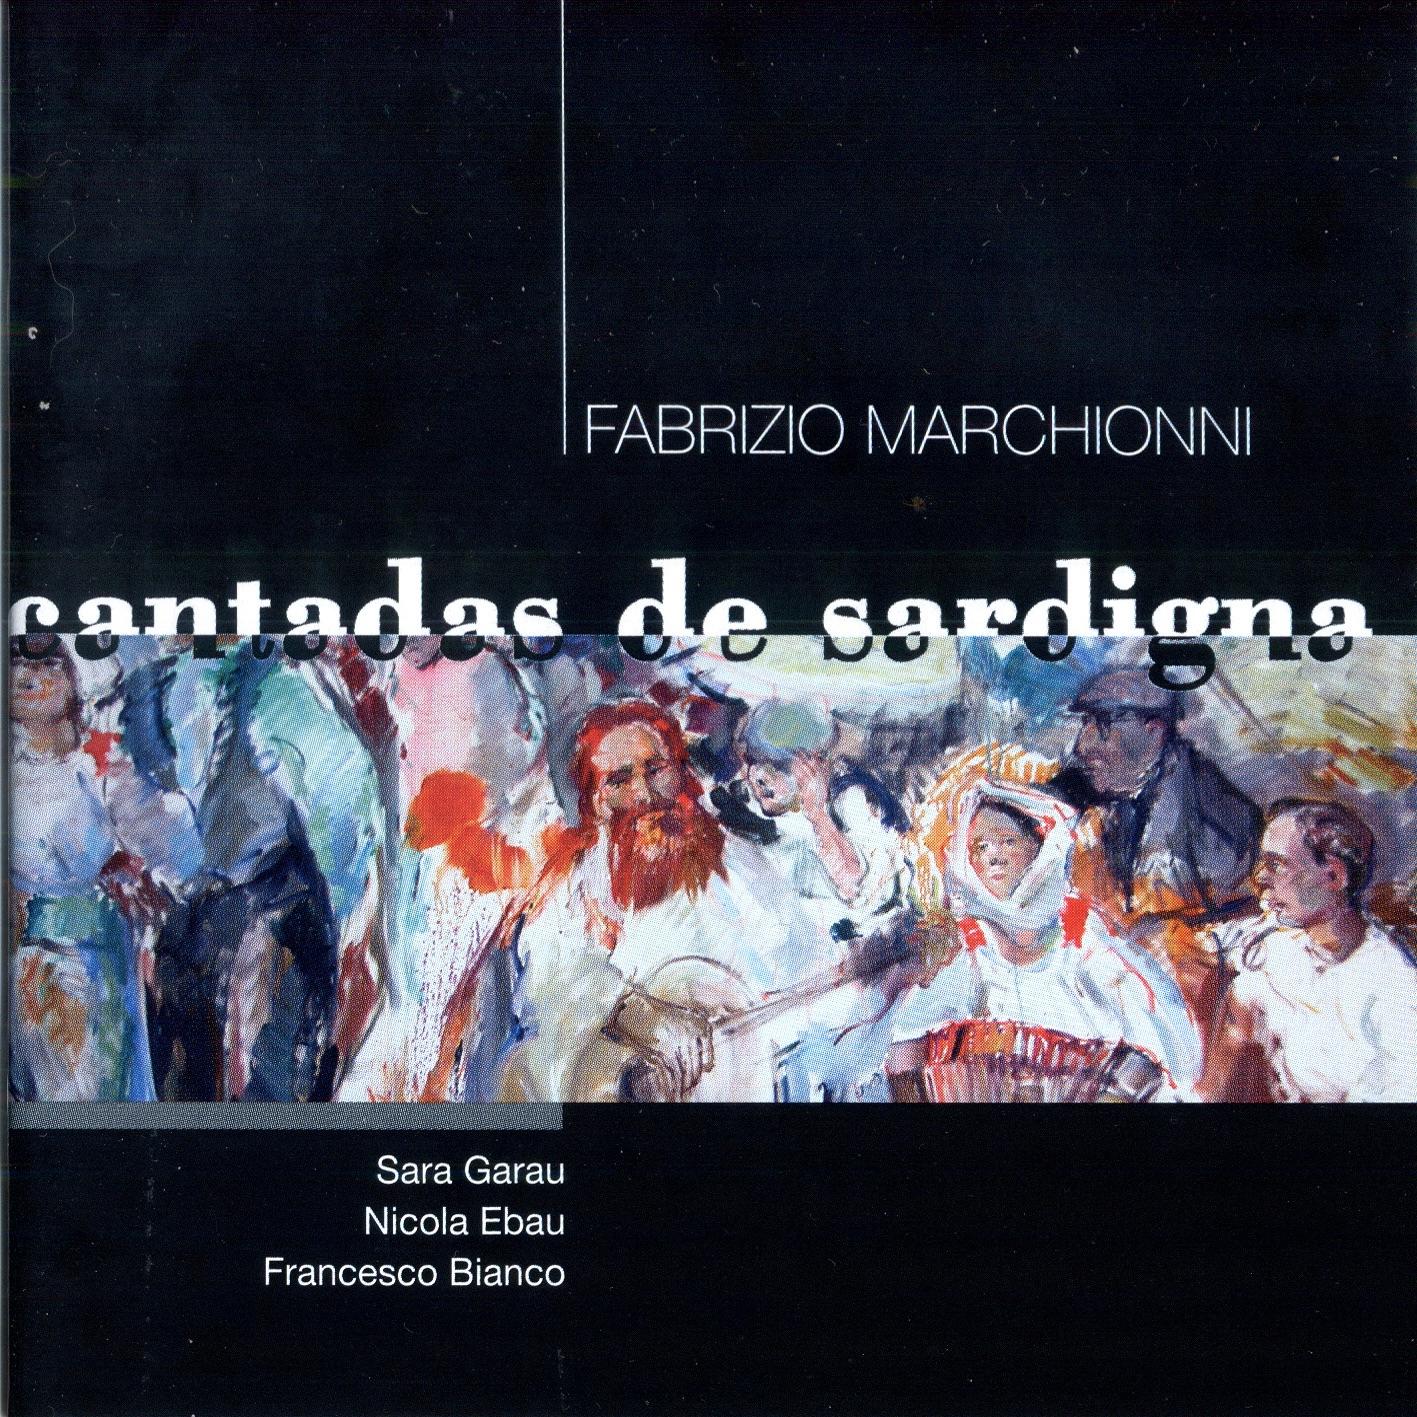 Piaghesa Antiga (feat. Sara Garau, Nicola Ebau, Francesco Bianco)